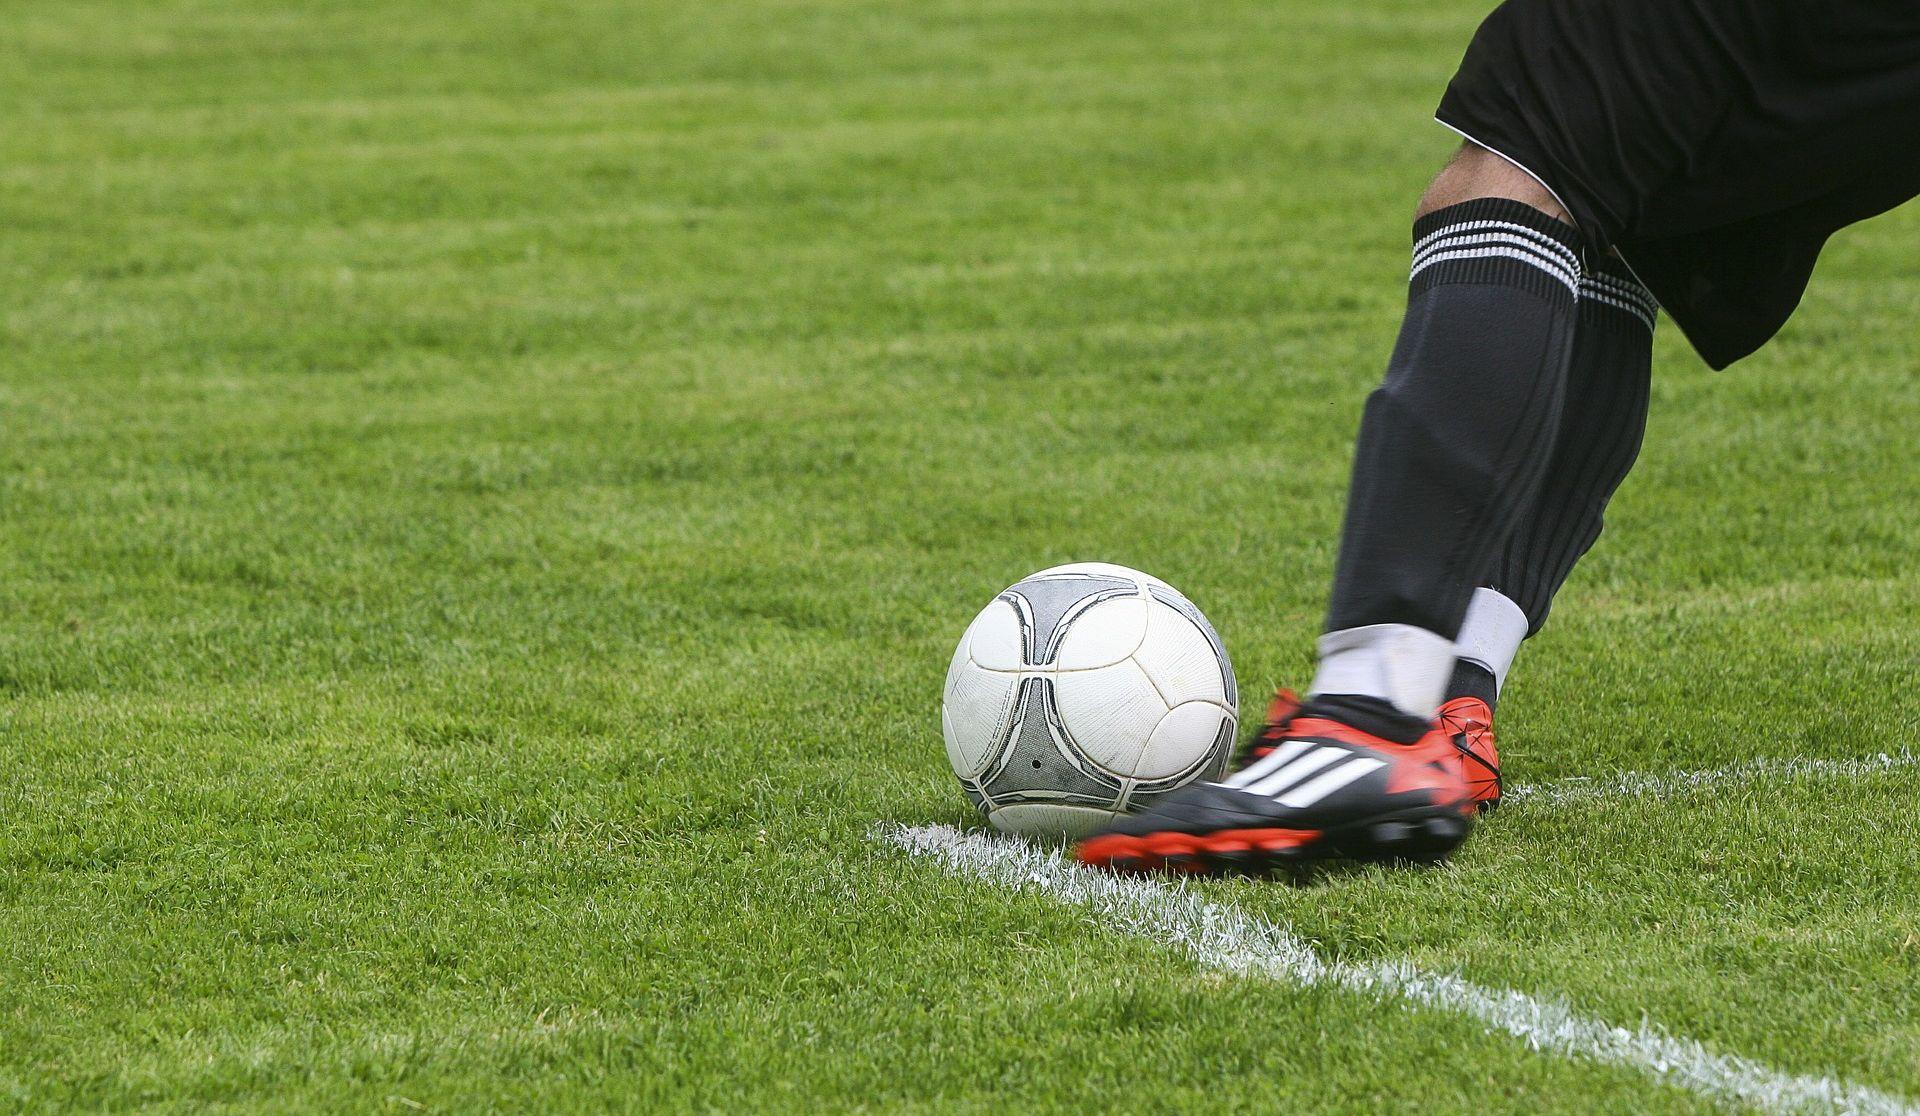 ENGLESKA Tottenham doveo mladog argentinskog reprezentativca Foytha